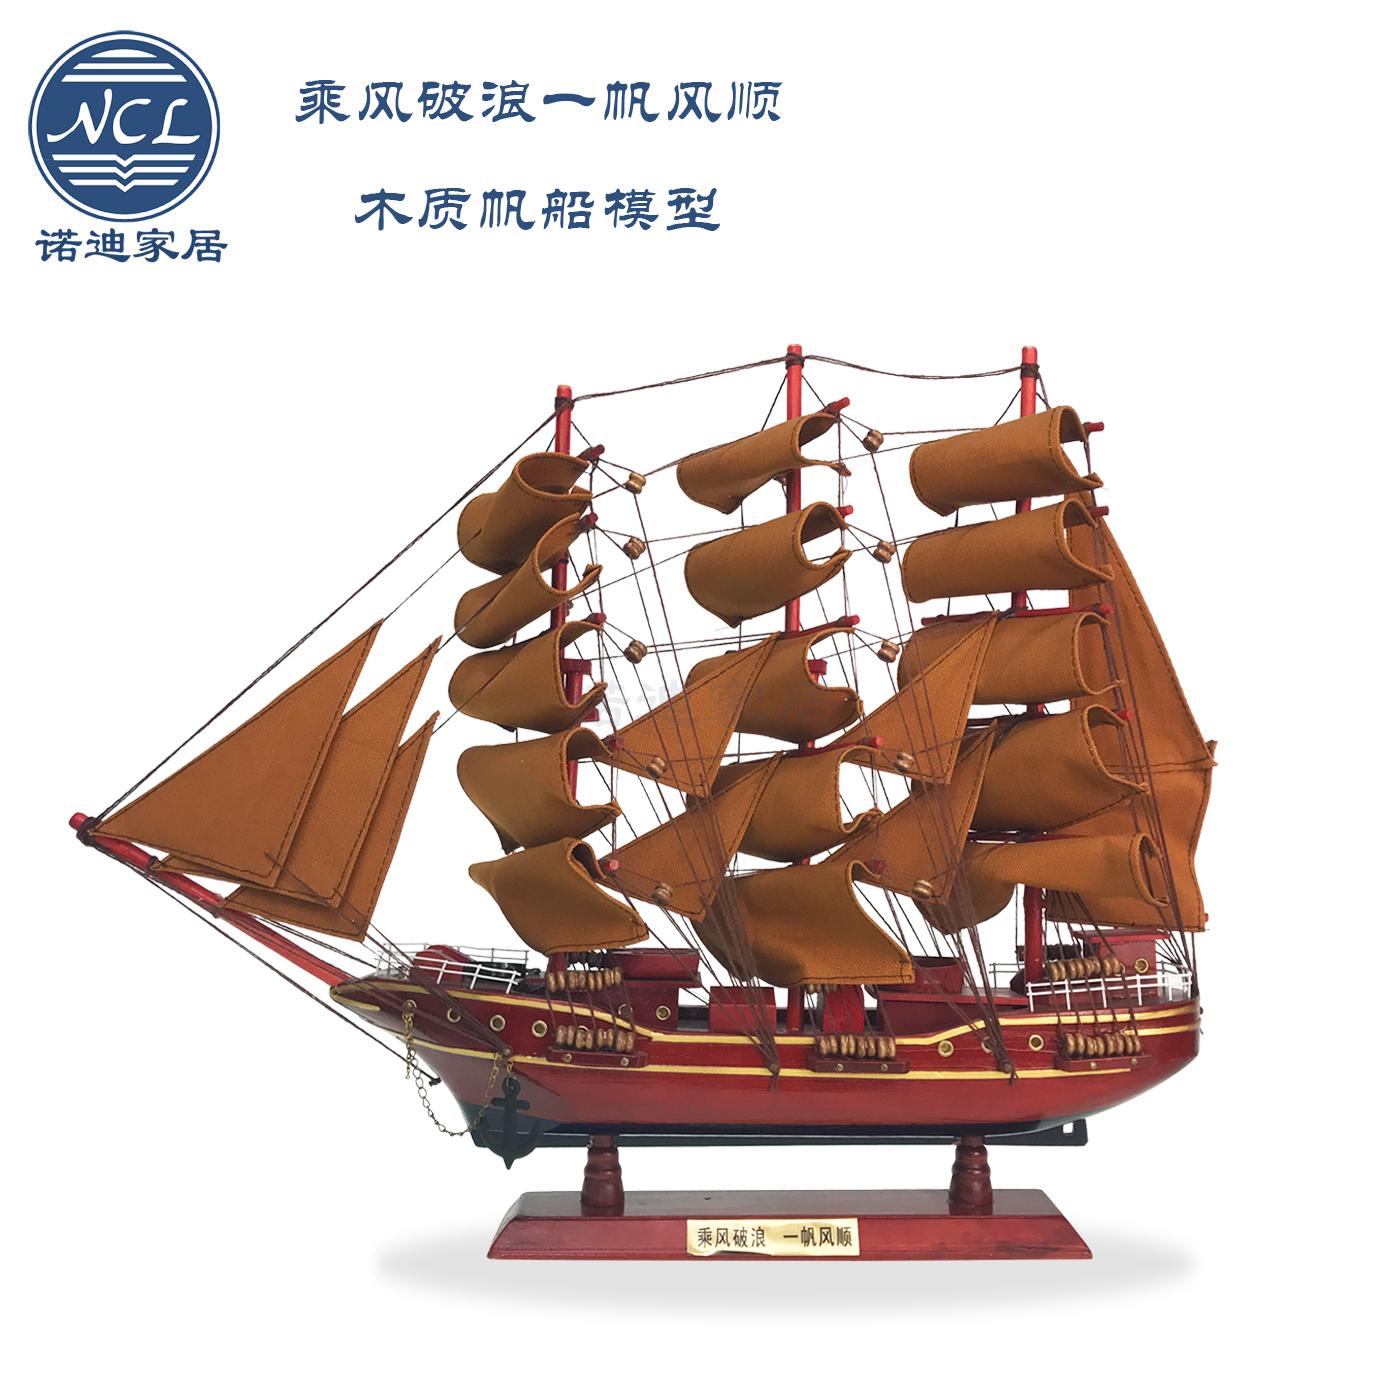 v帆船最新帆船图纸锻造信息模型制作帆船模型图纸德拉诺制做图片